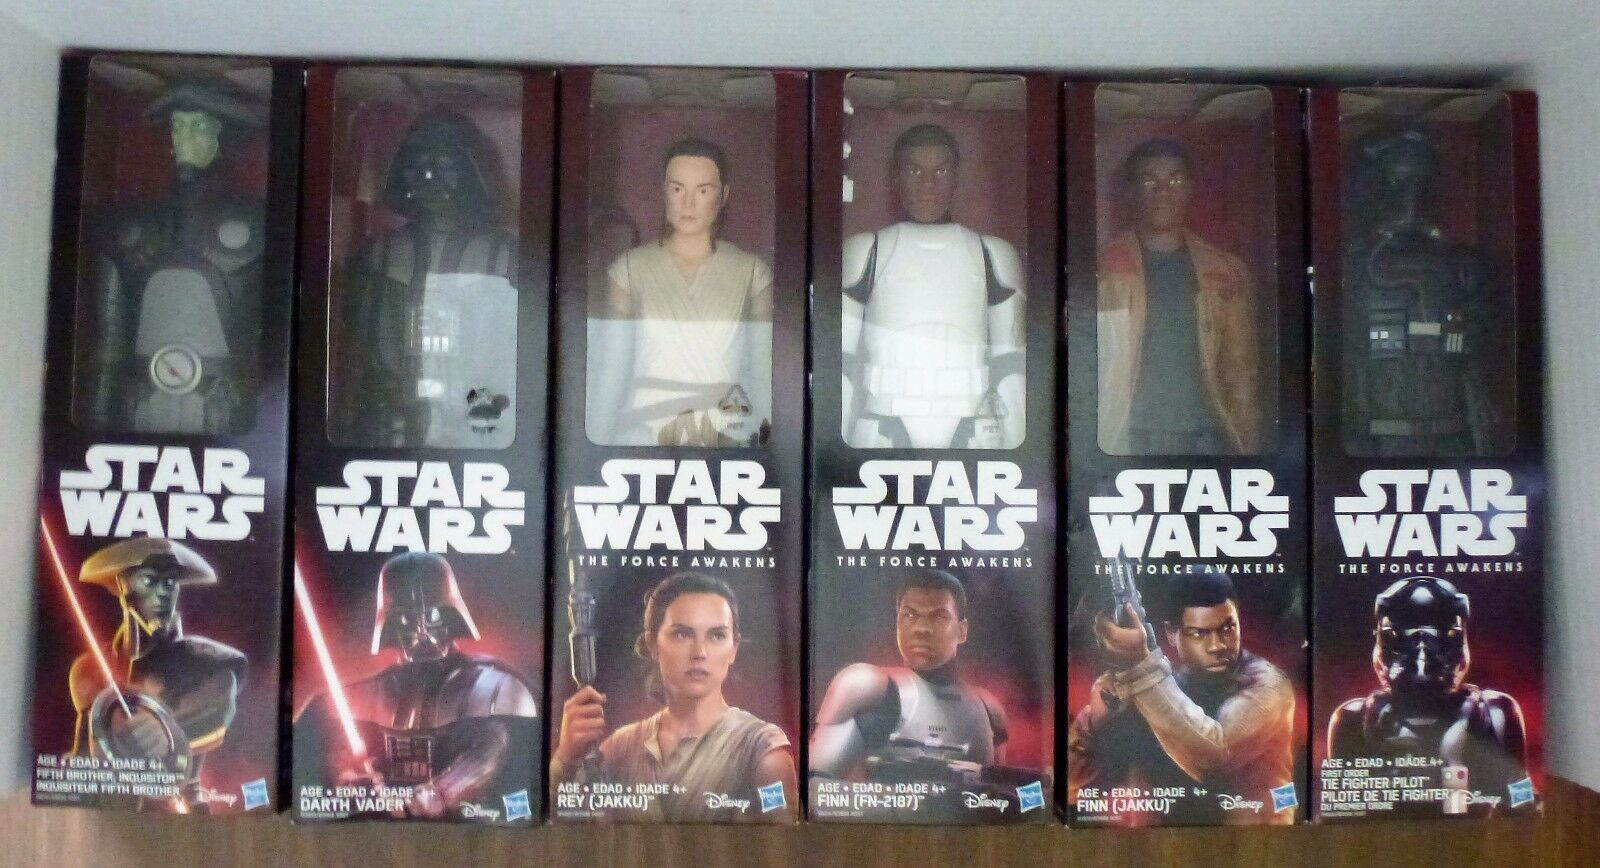 Star Wars Force Awakens 12 inch 6 Figure Set includes Rey, Vader, Finn 2 , etc